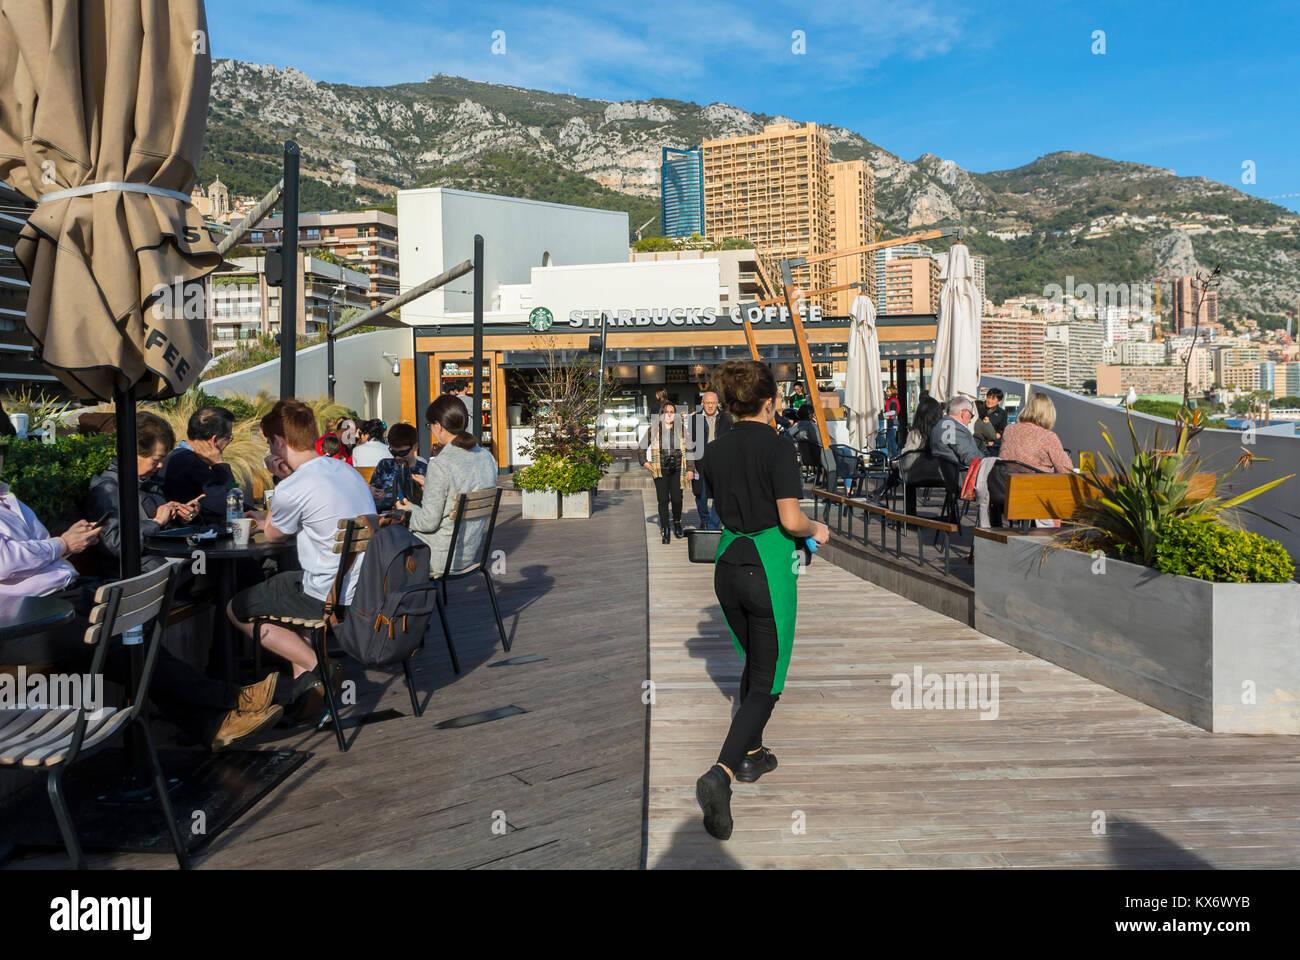 Monaco, Monte Carlo, Starbuck's Cafe Restaurant - Stock Image